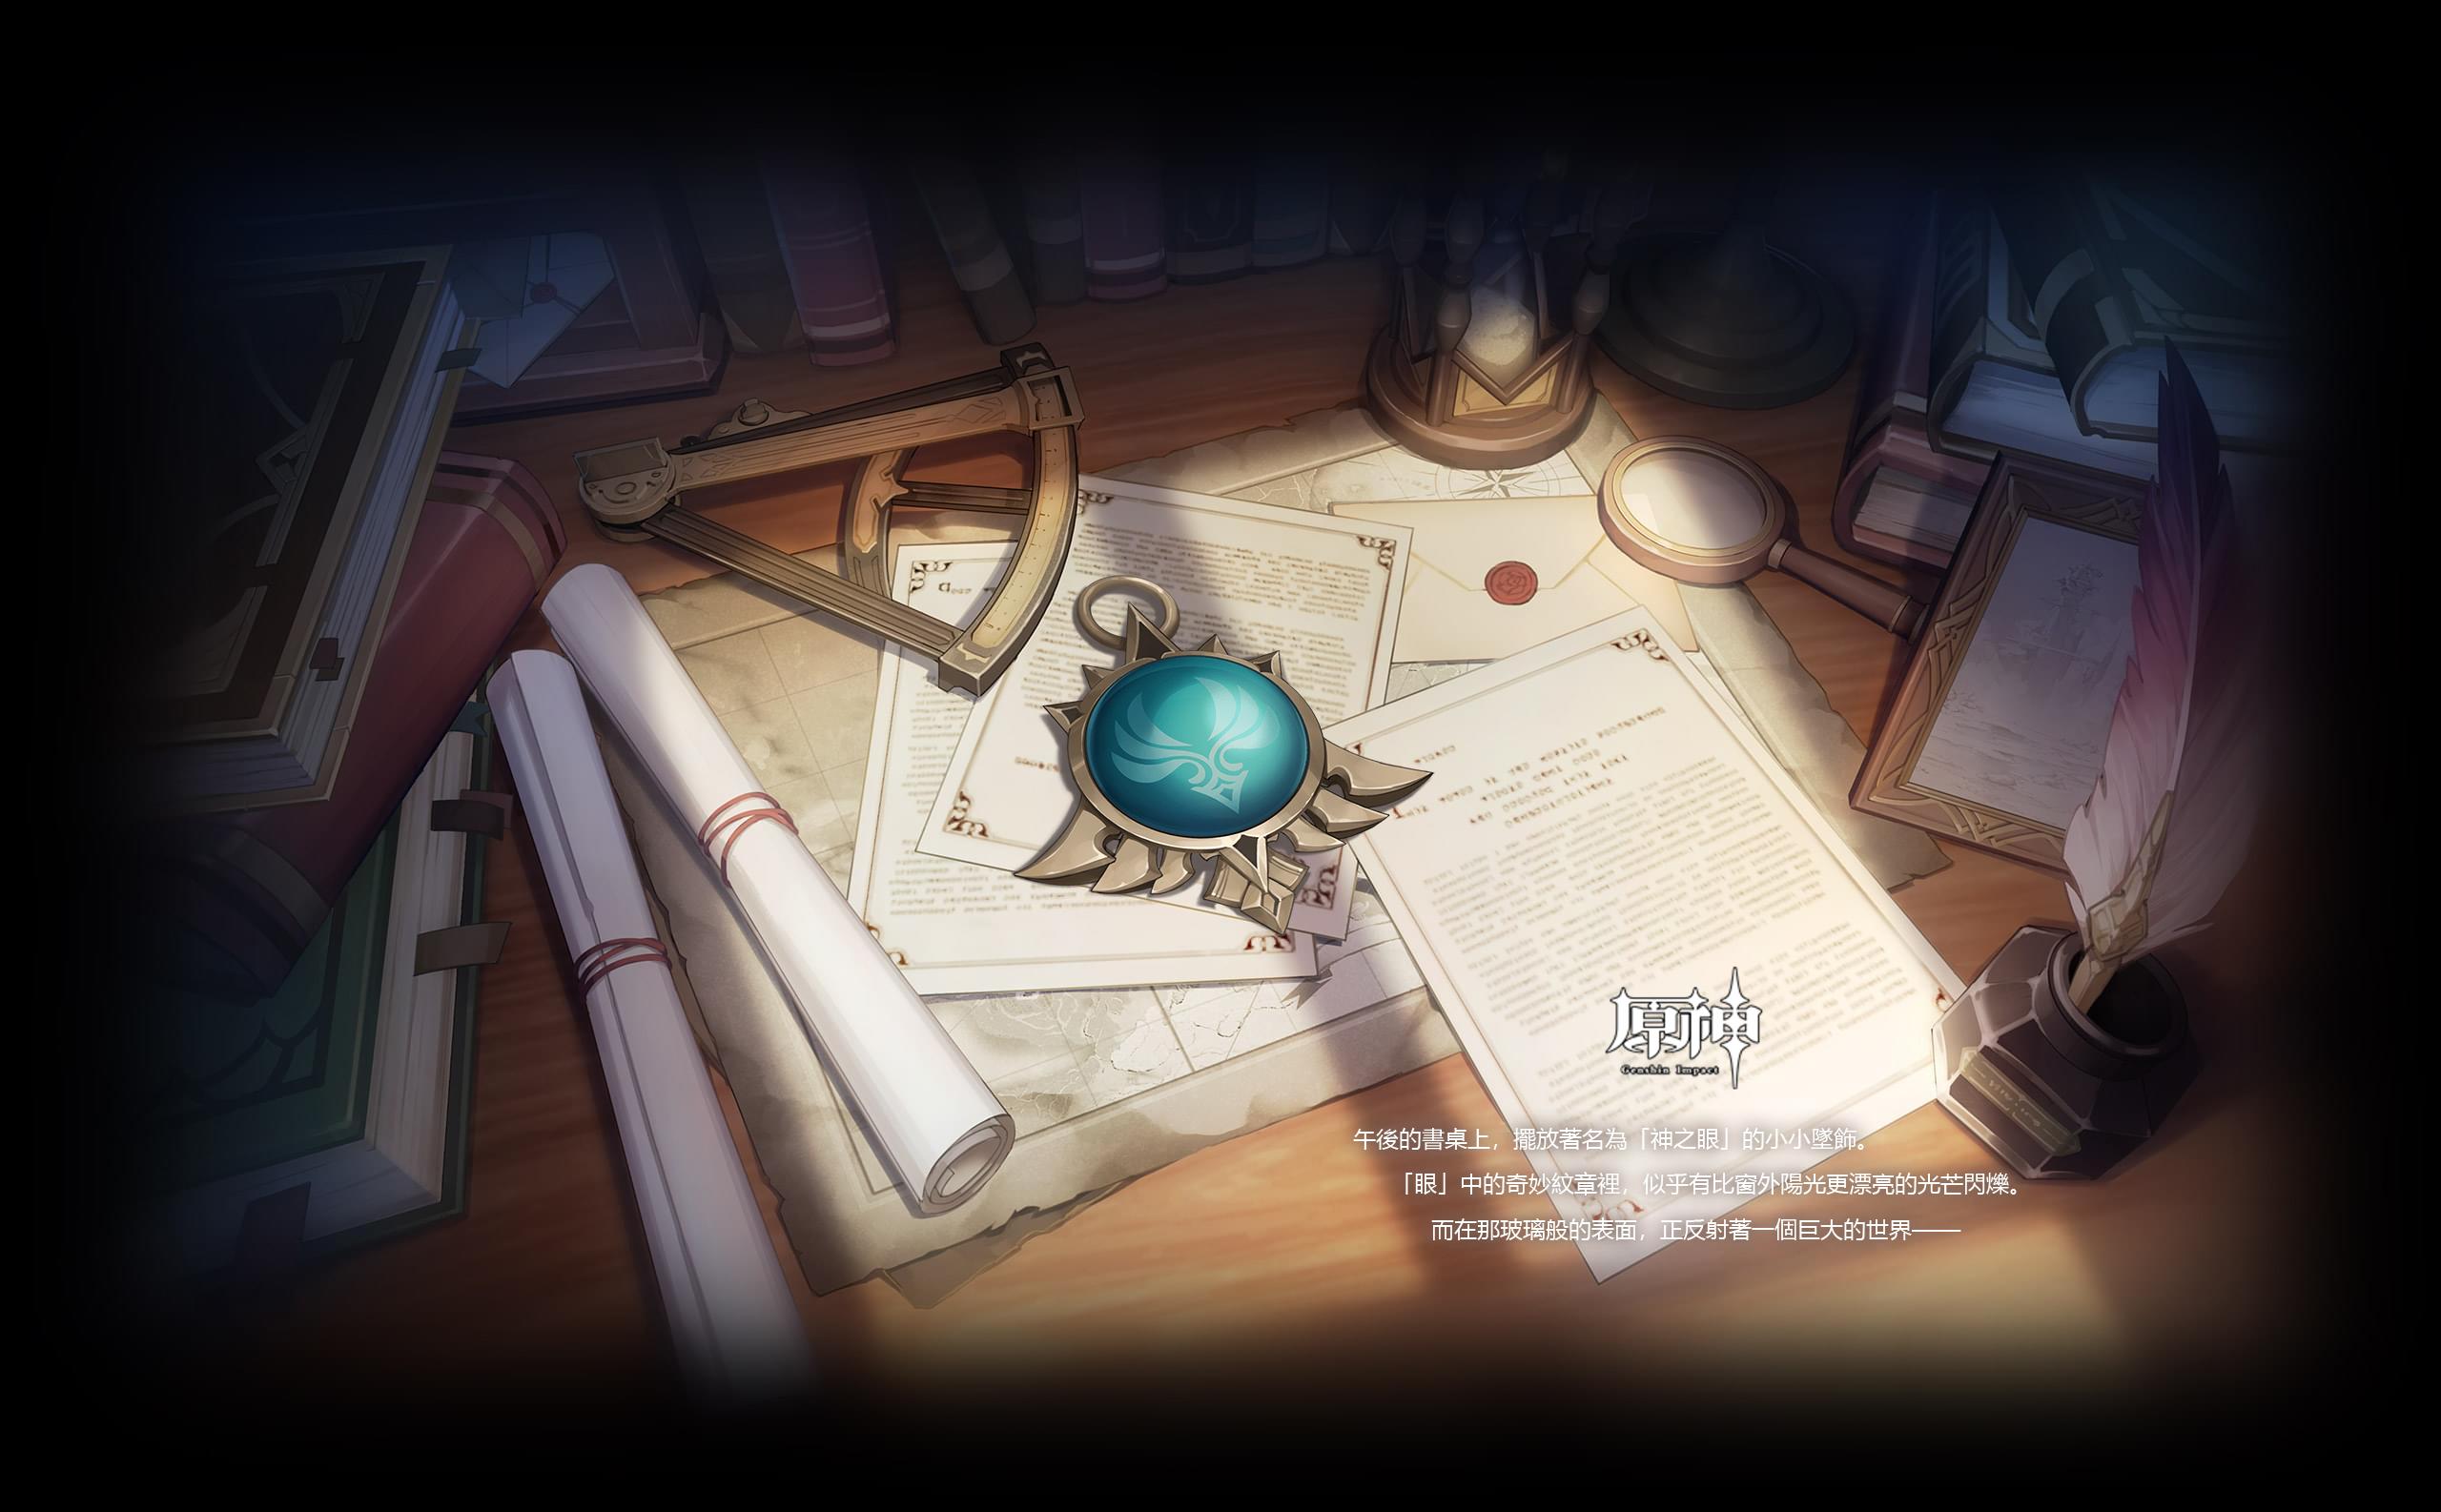 《原神》預計於2020年9月底在PC、Switch、PS4、Android及iOS等平台正式上線